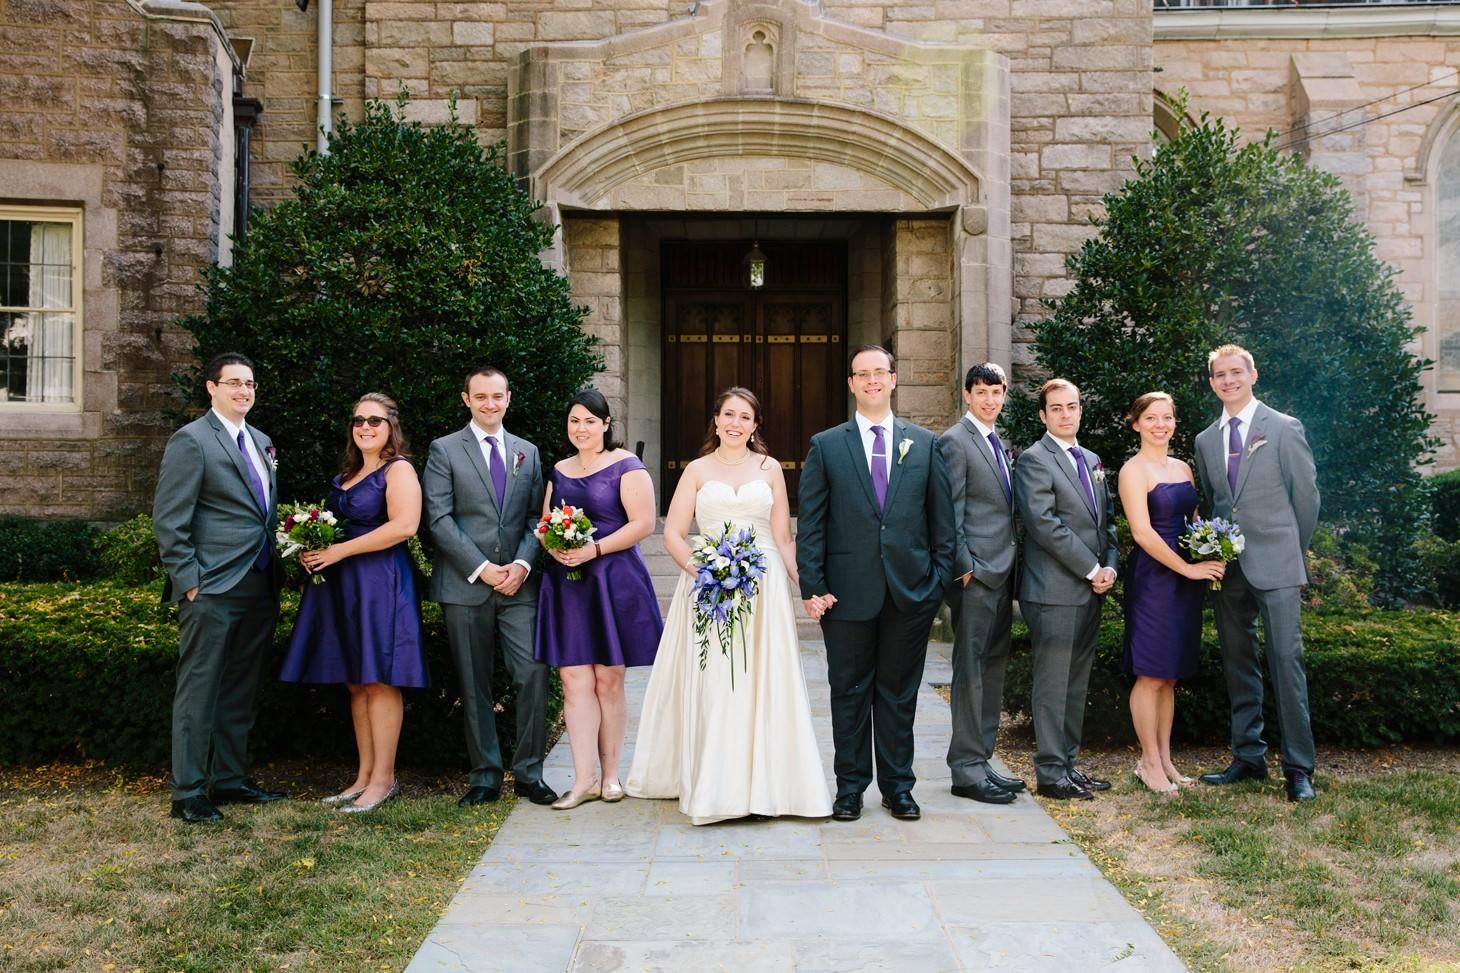 012-nyc-wedding-photographer-hoboken-waterfront-wedding-photos-smitten-chickens.jpg